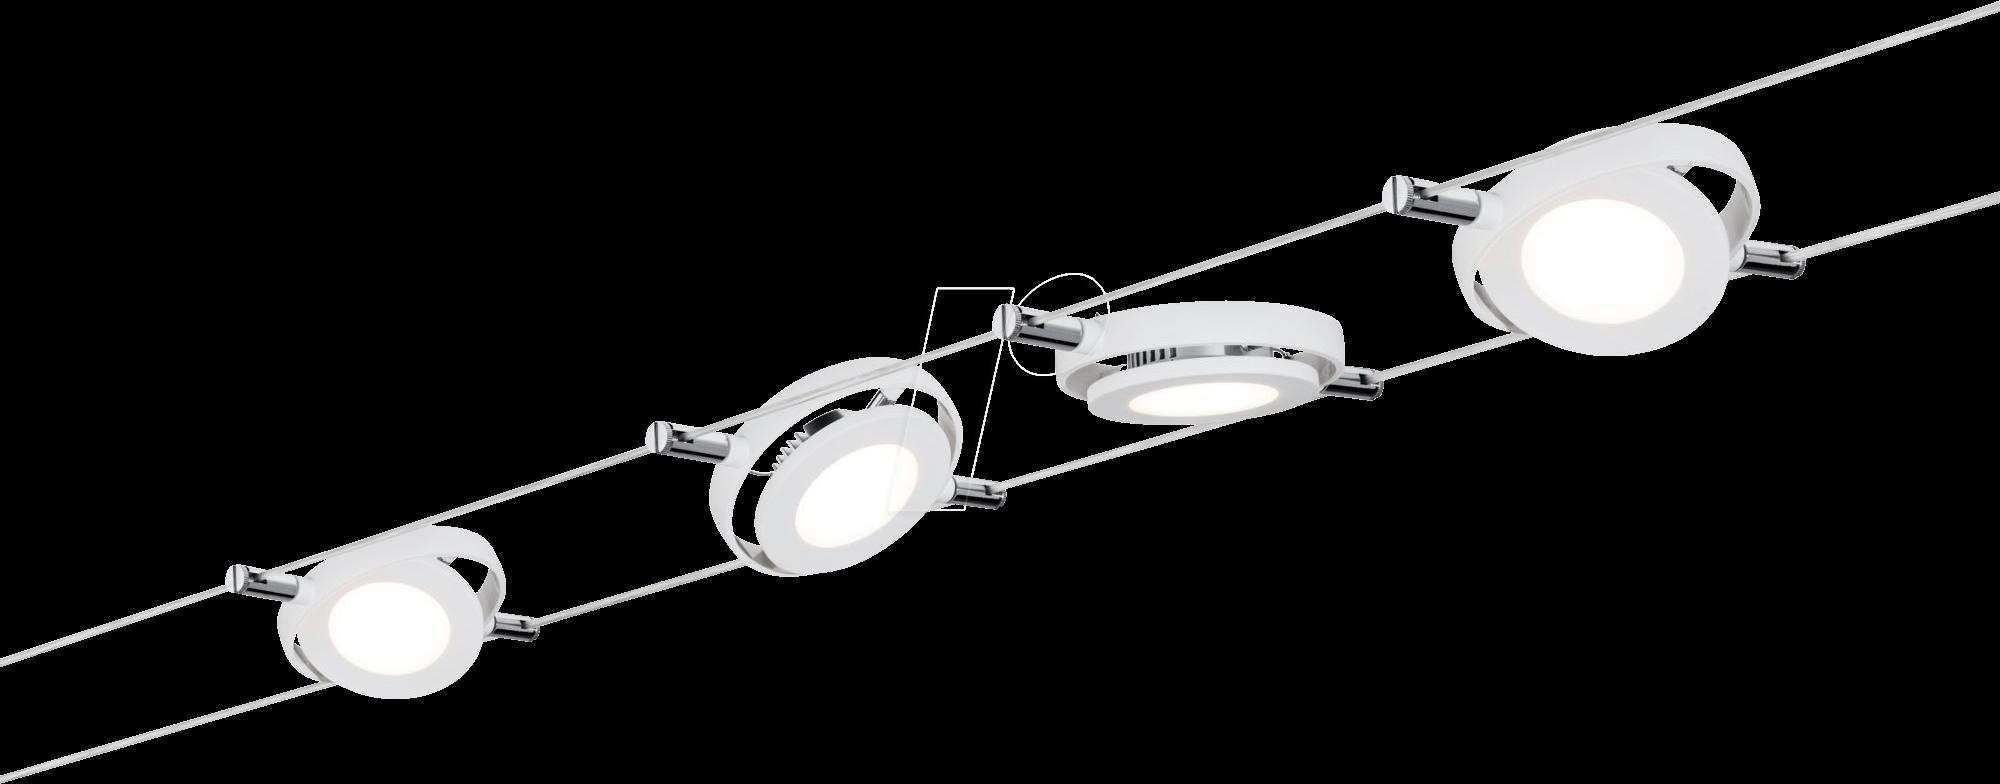 Plm 50107 smart light seilsystem roundmac 4x4w eek a for Binario paulmann